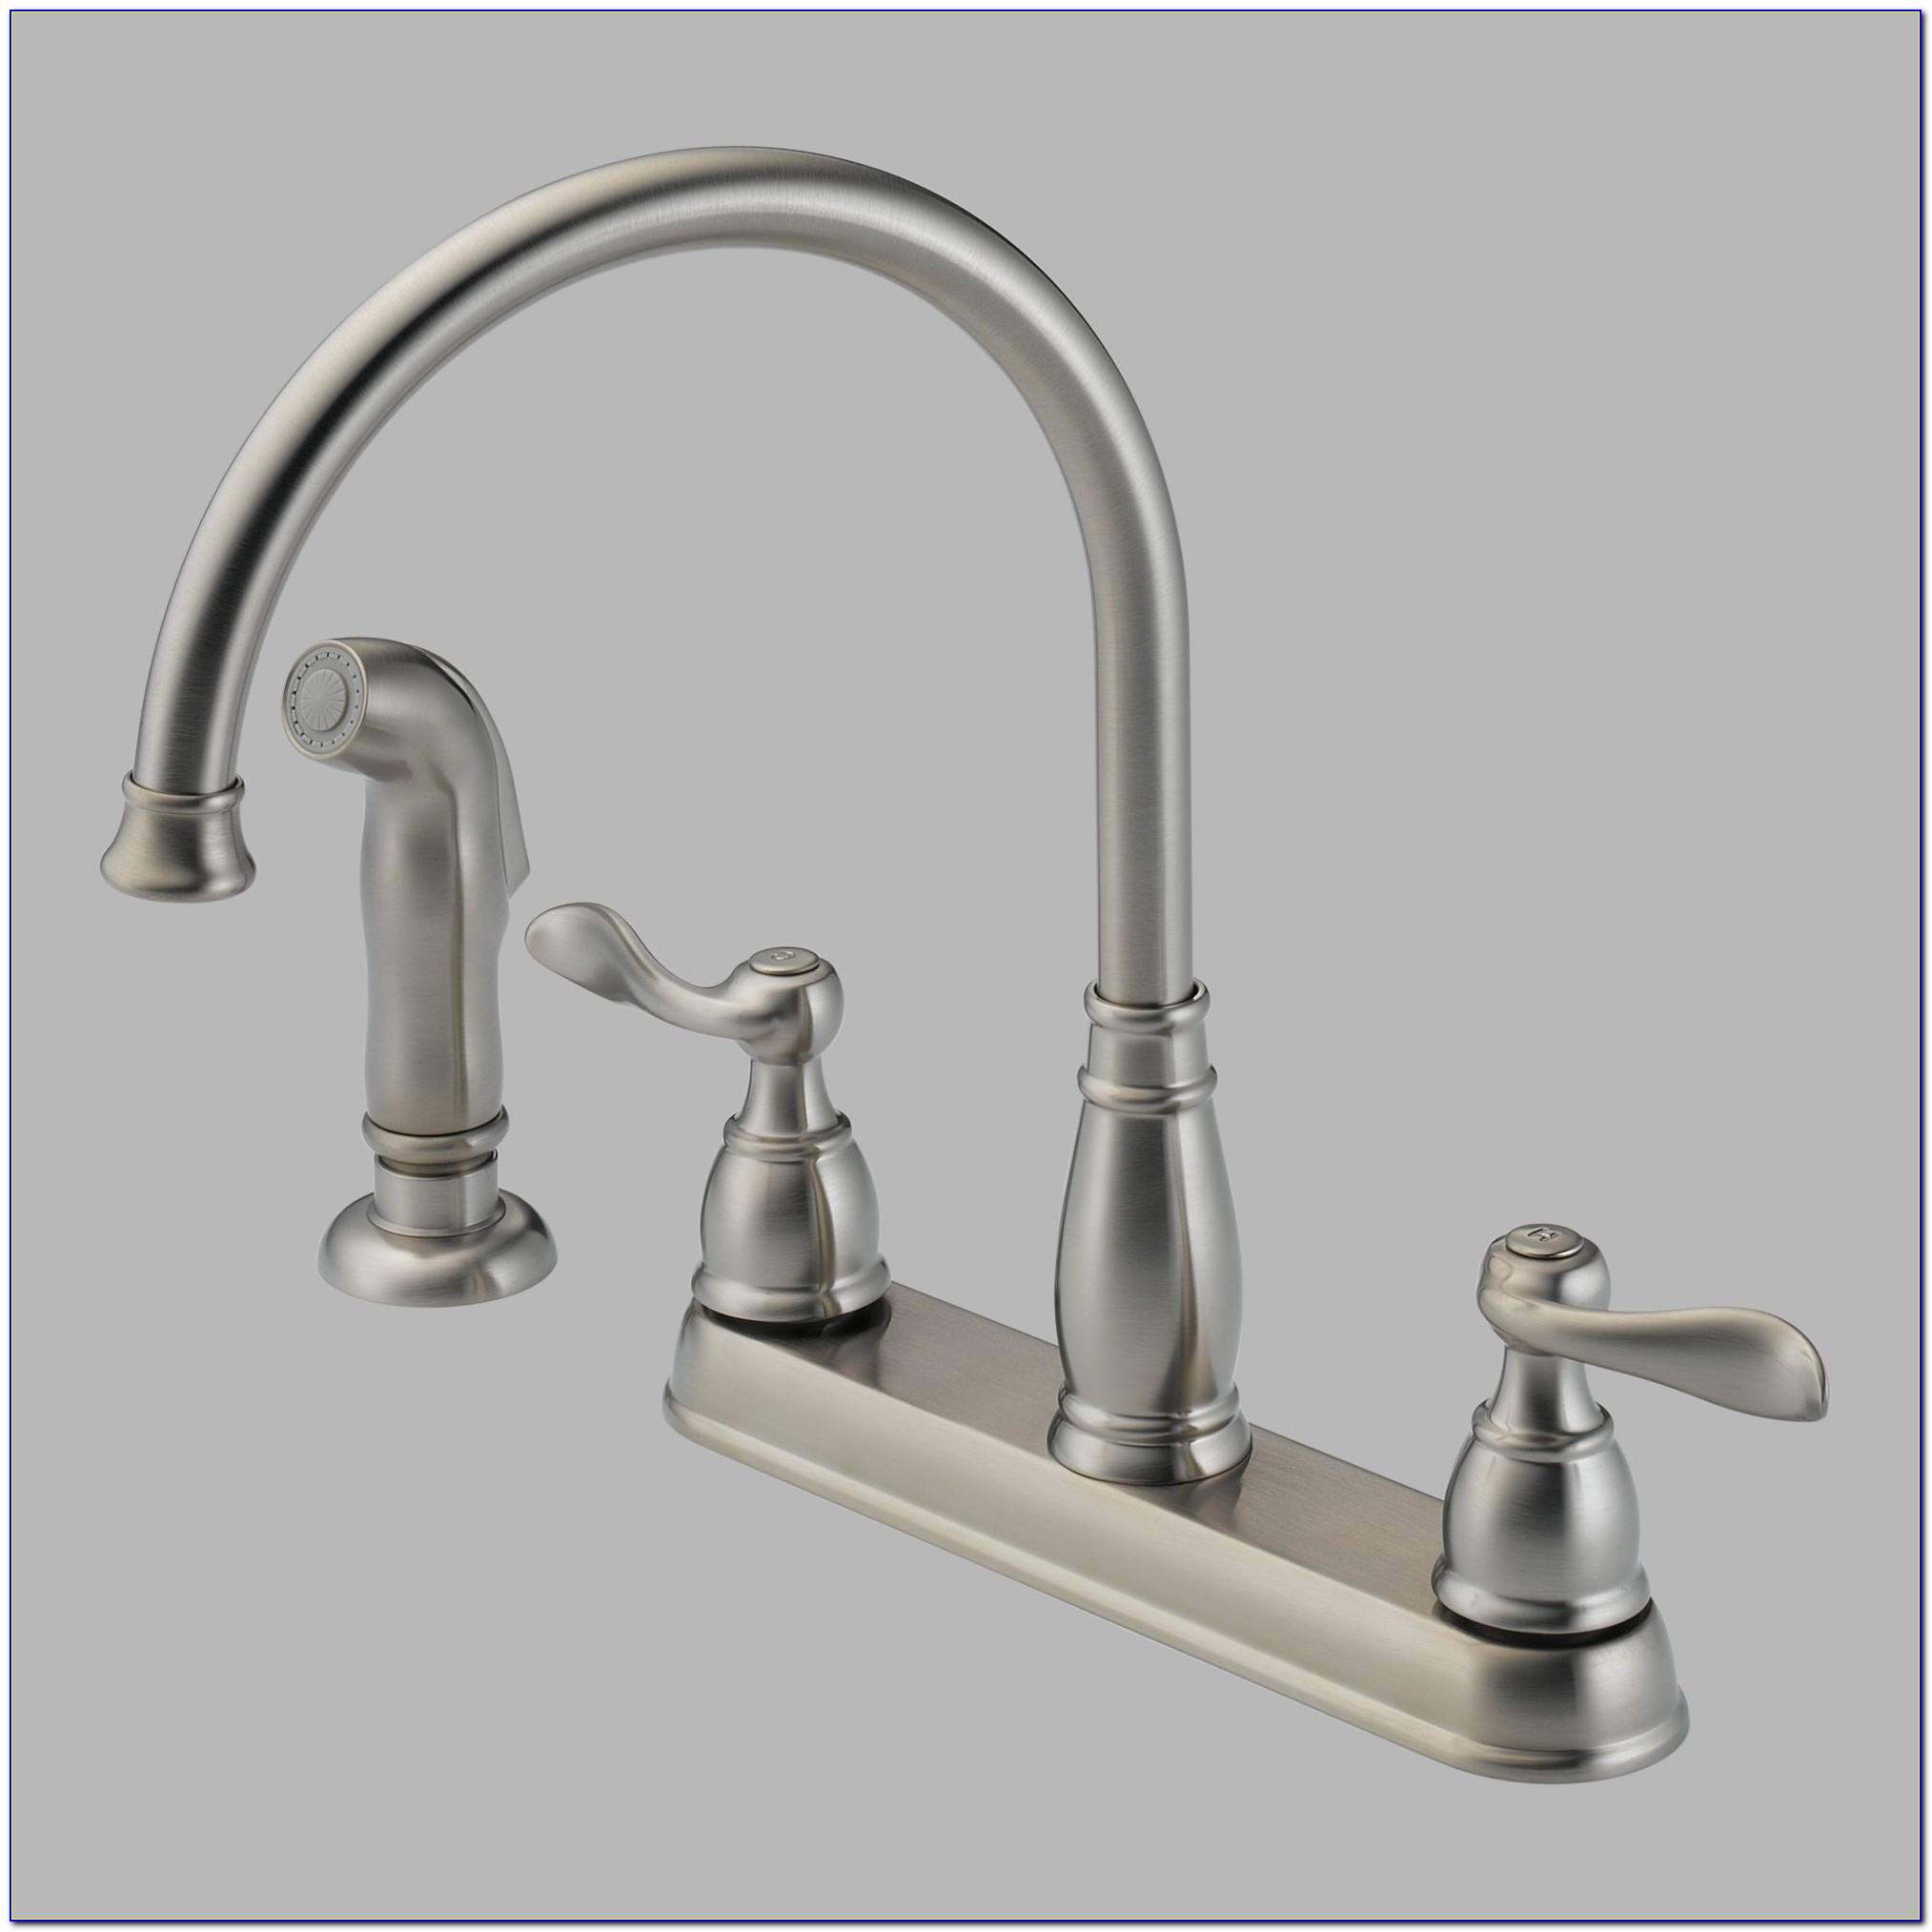 Moen Monticello Roman Tub Faucet Cartridge